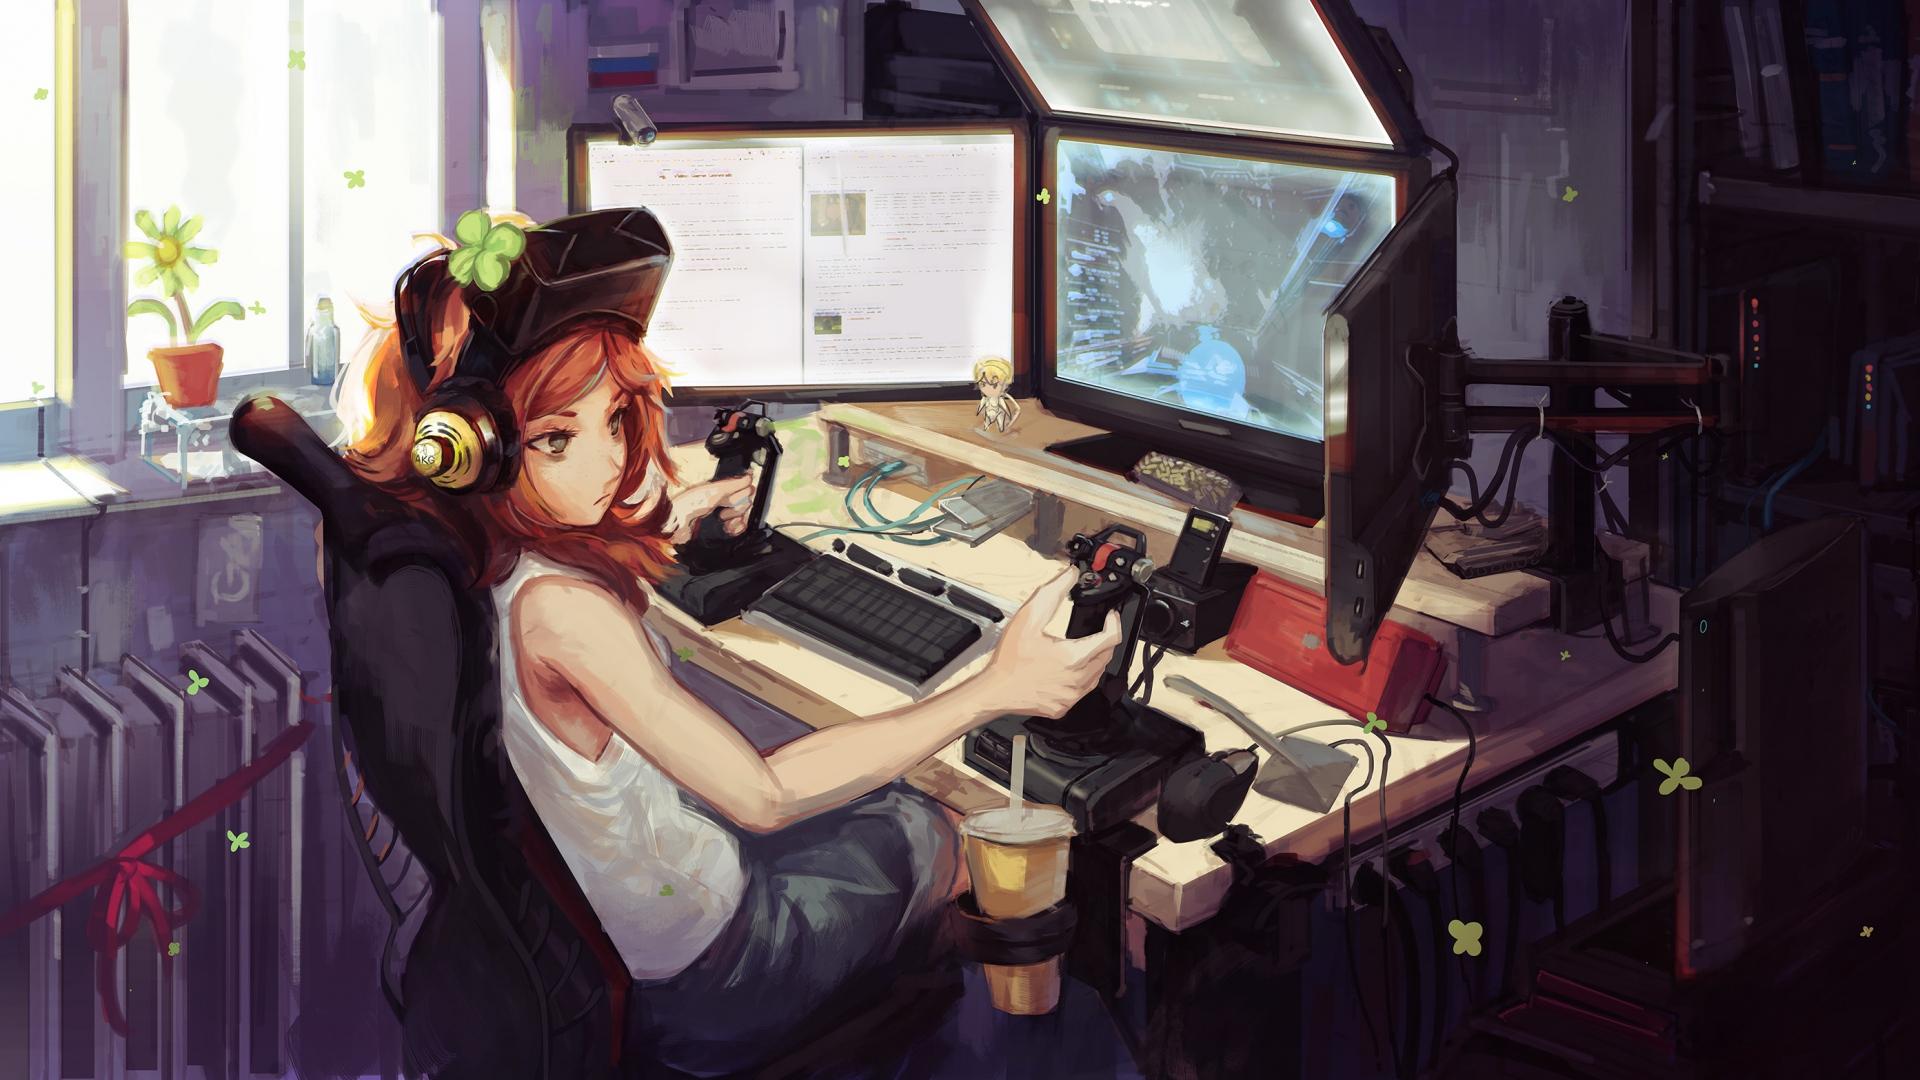 Gamer hd wallpapers pixelstalk net